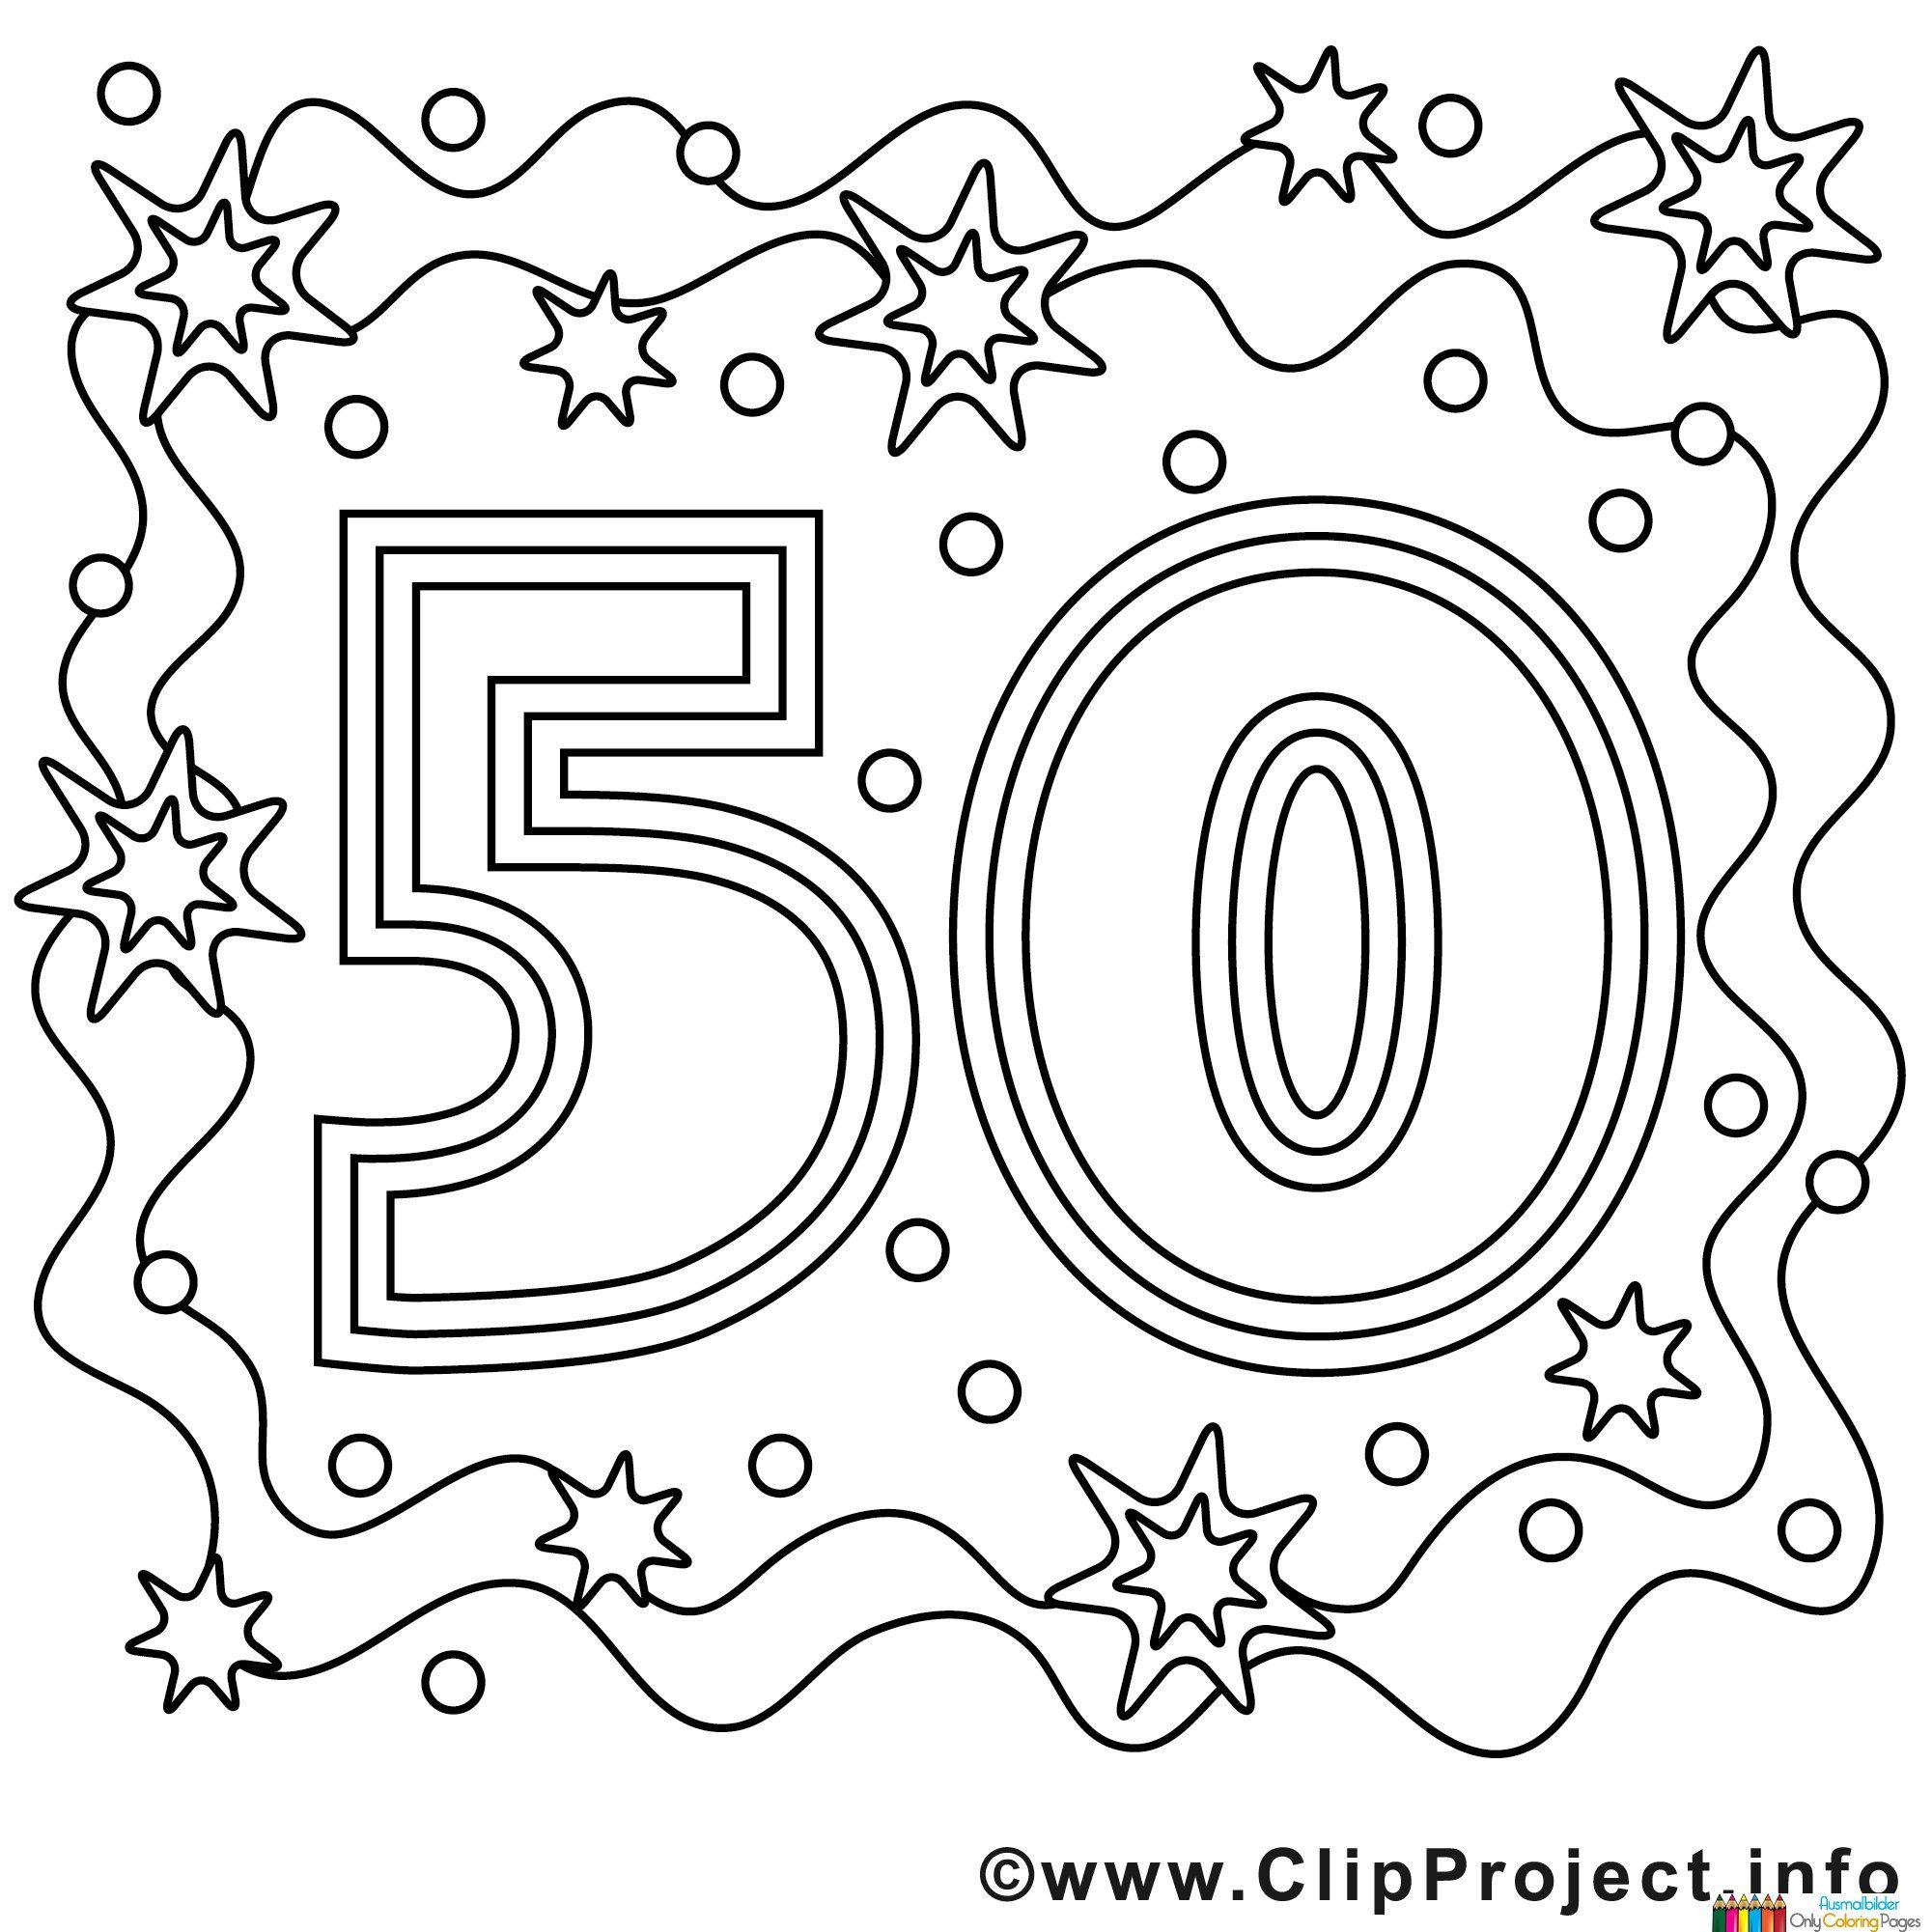 Ausmalbilder Mama Geburtstag : Ausmalbild Zum 50 Geburtstag 50 Geburtstag Pinterest Zum 50